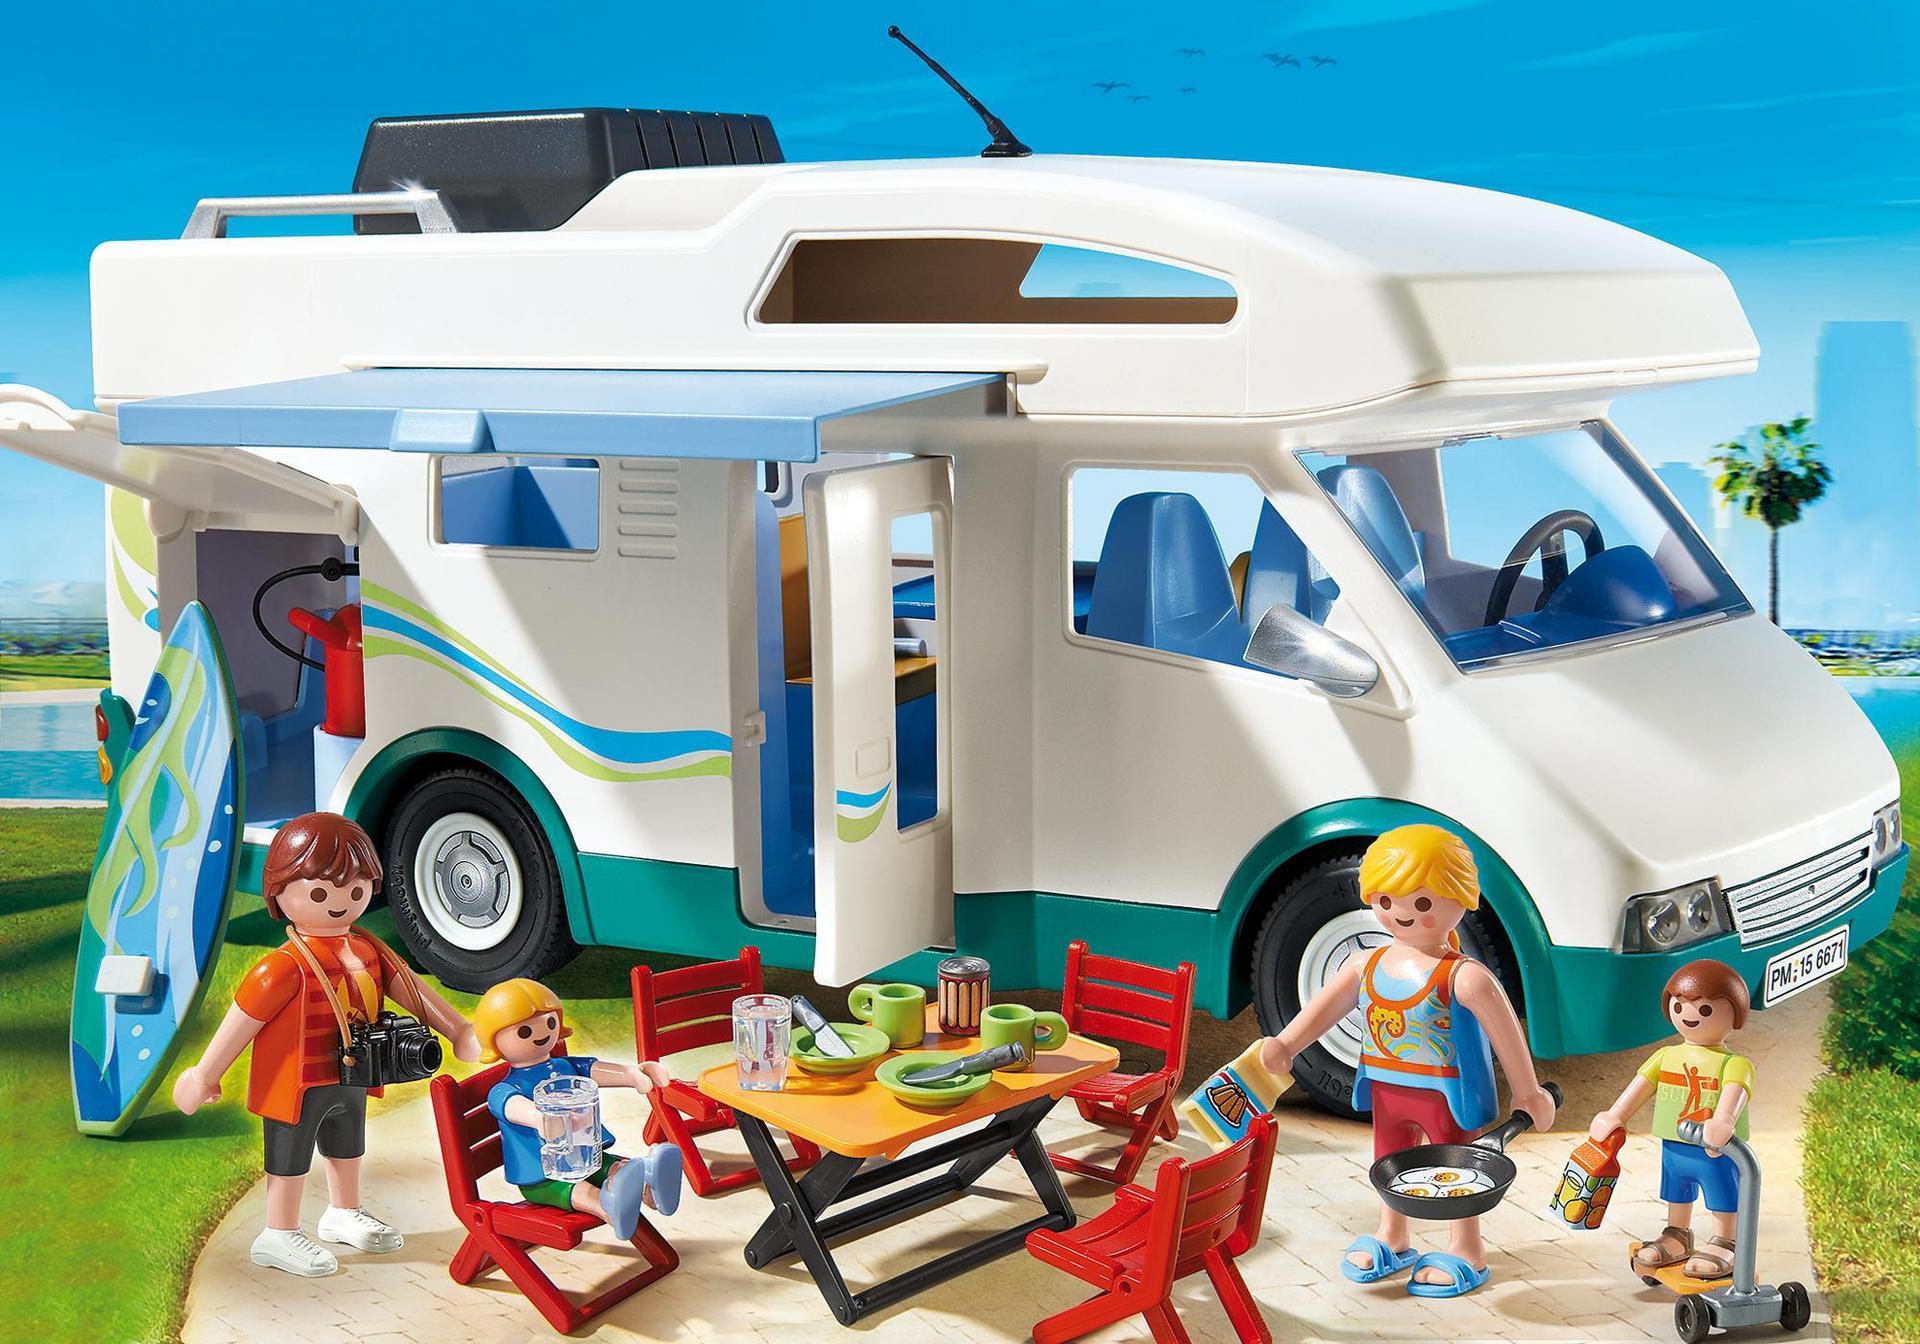 Ausmalbilder Playmobil Kreuzfahrtschiff : Familien Wohnmobil 6671 Playmobil Schweiz